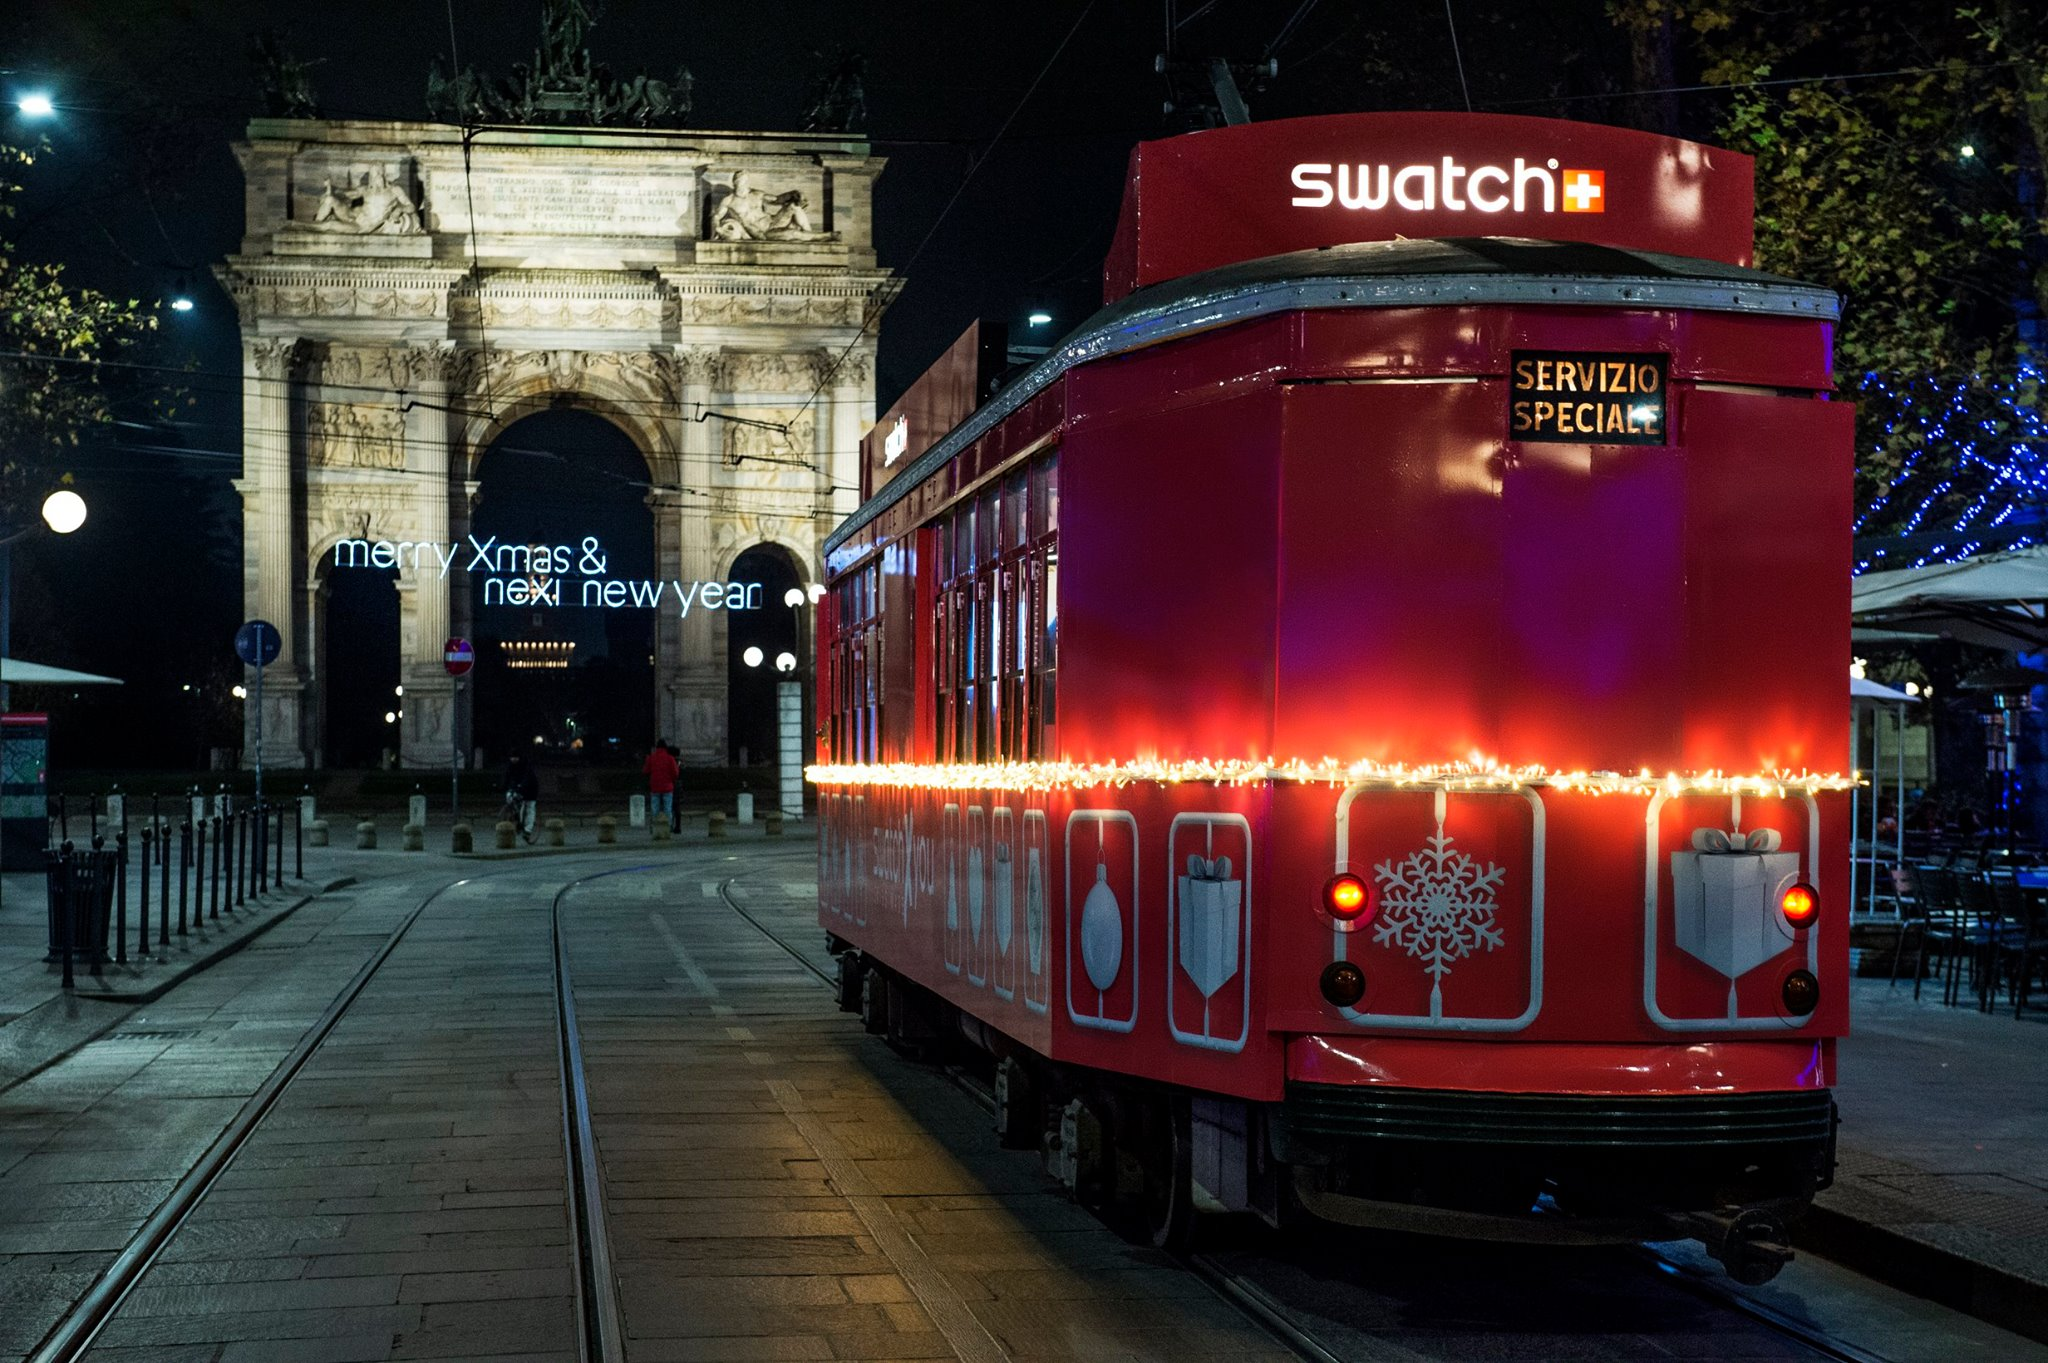 Tram Swatch Milano